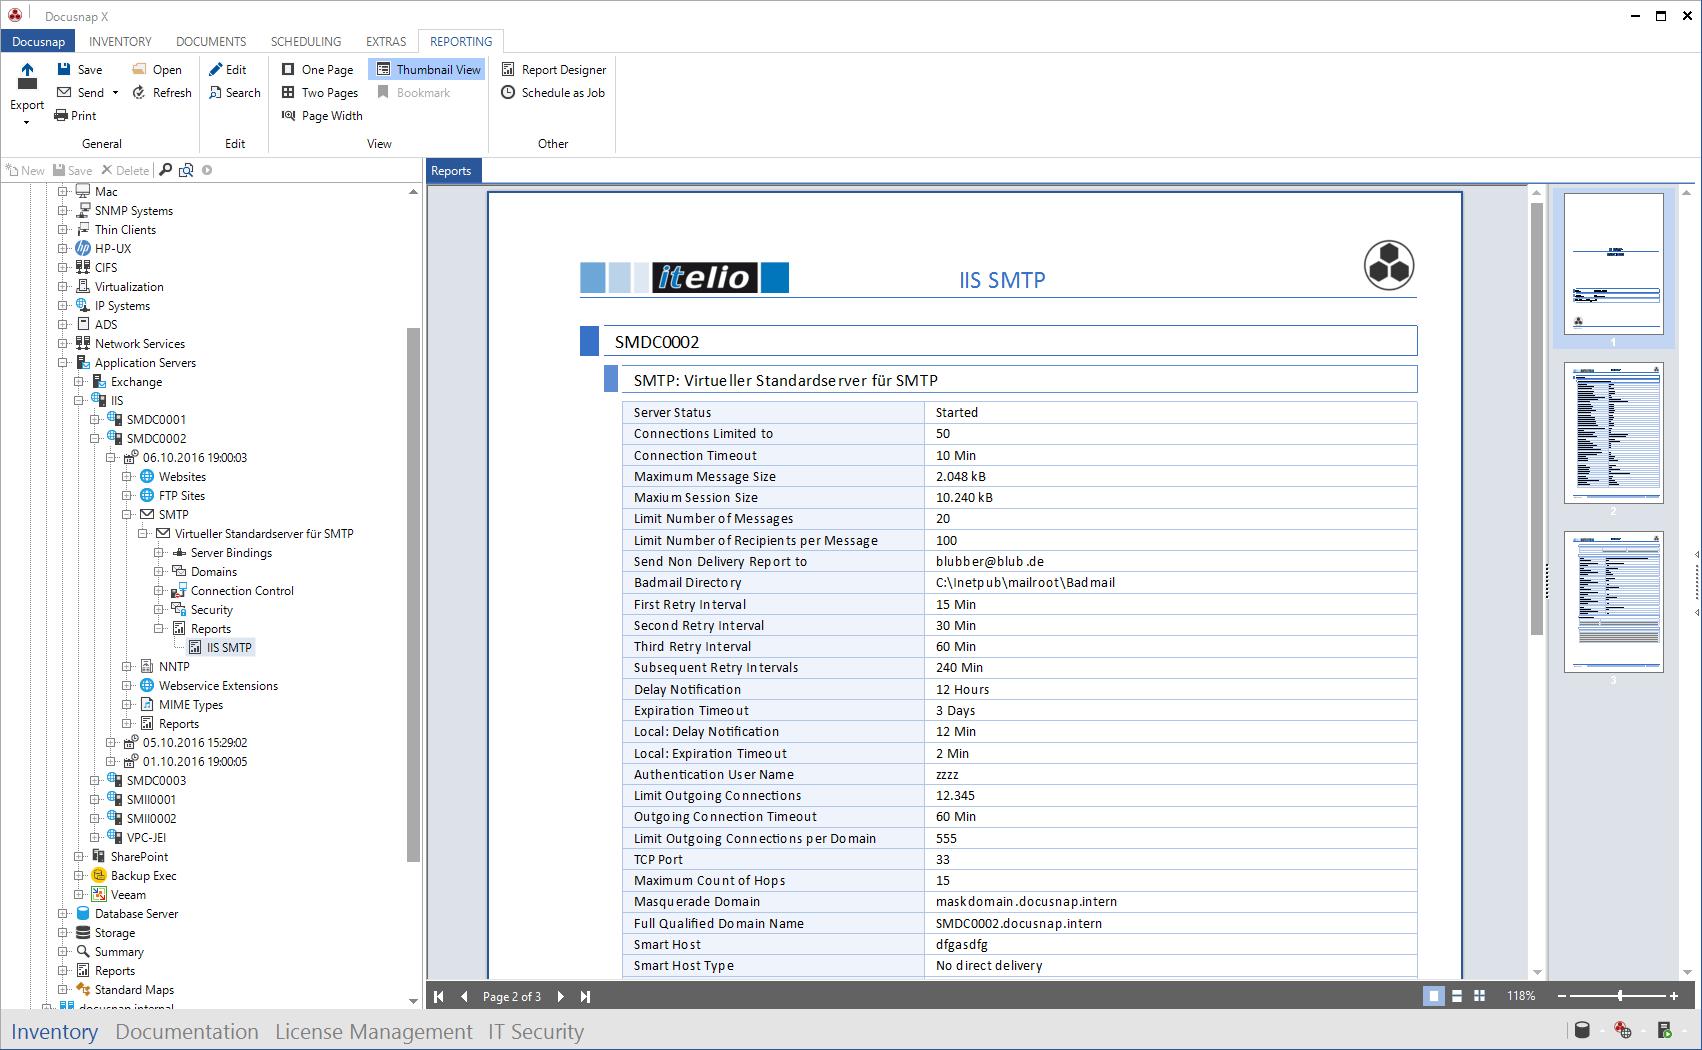 Report IIS SMTP